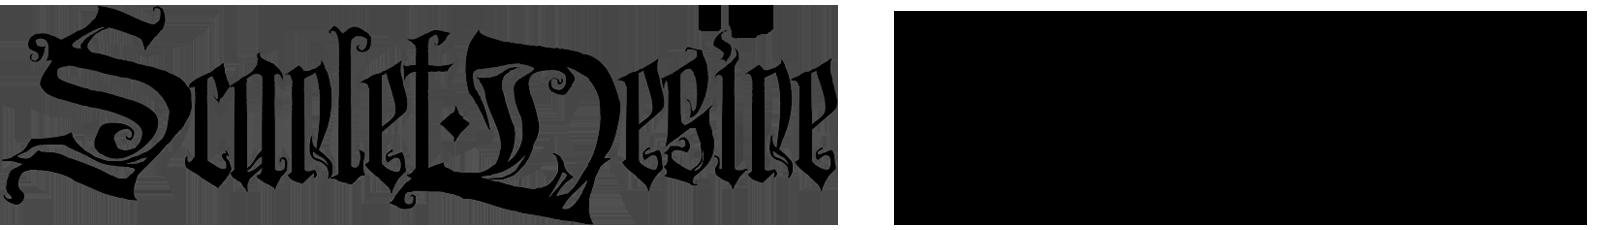 DANAE KOMODROMOU - Logo_Top